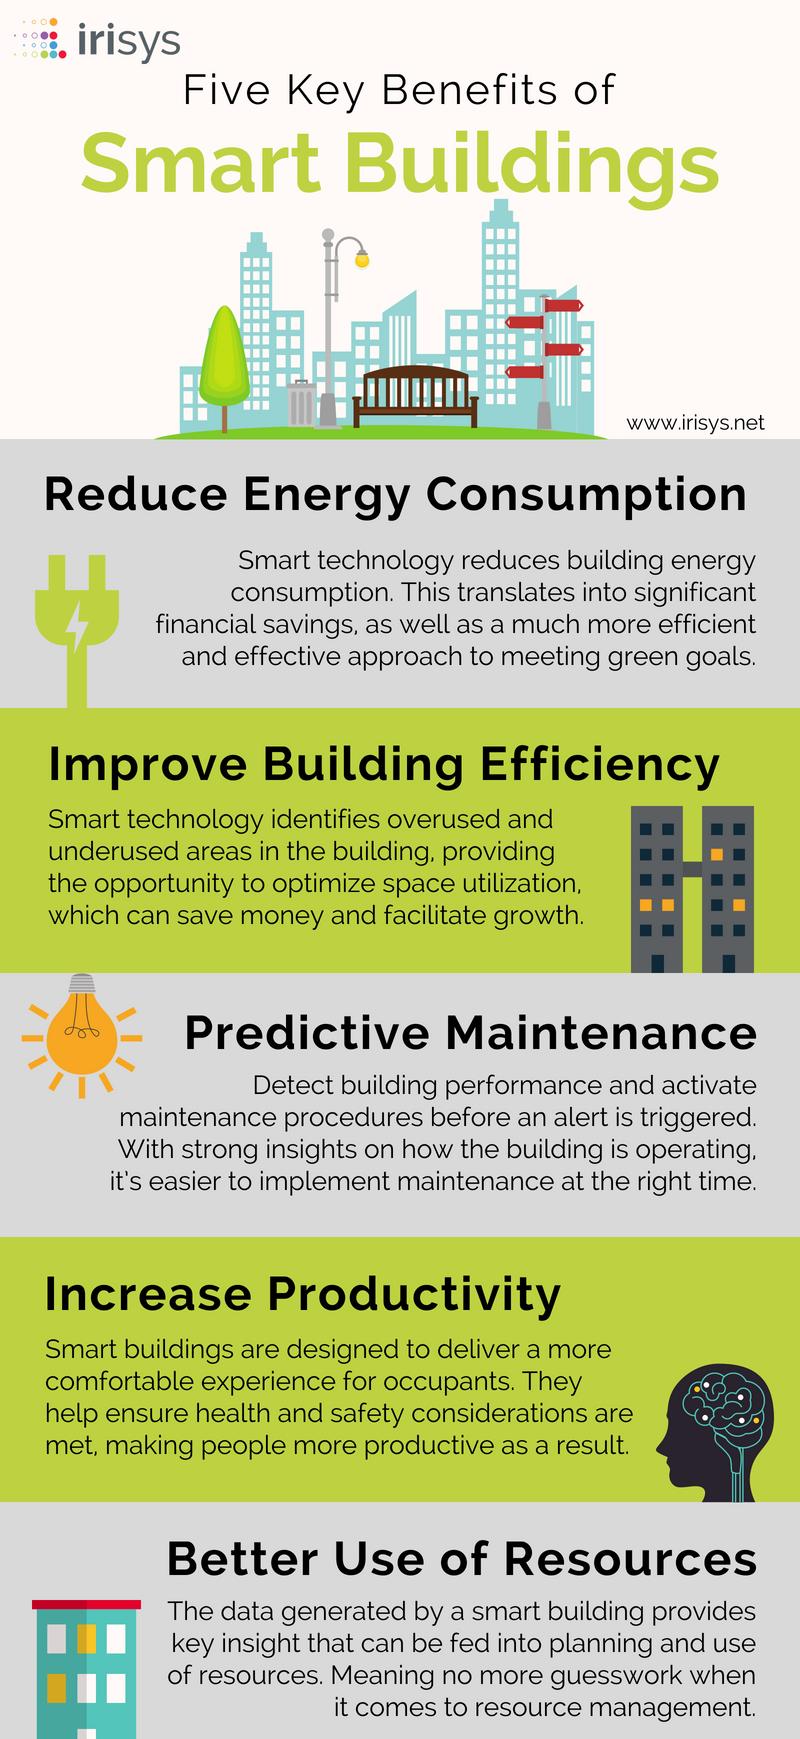 5 Key Benefits of Smart Buildings - FINAL - 5.31.2018